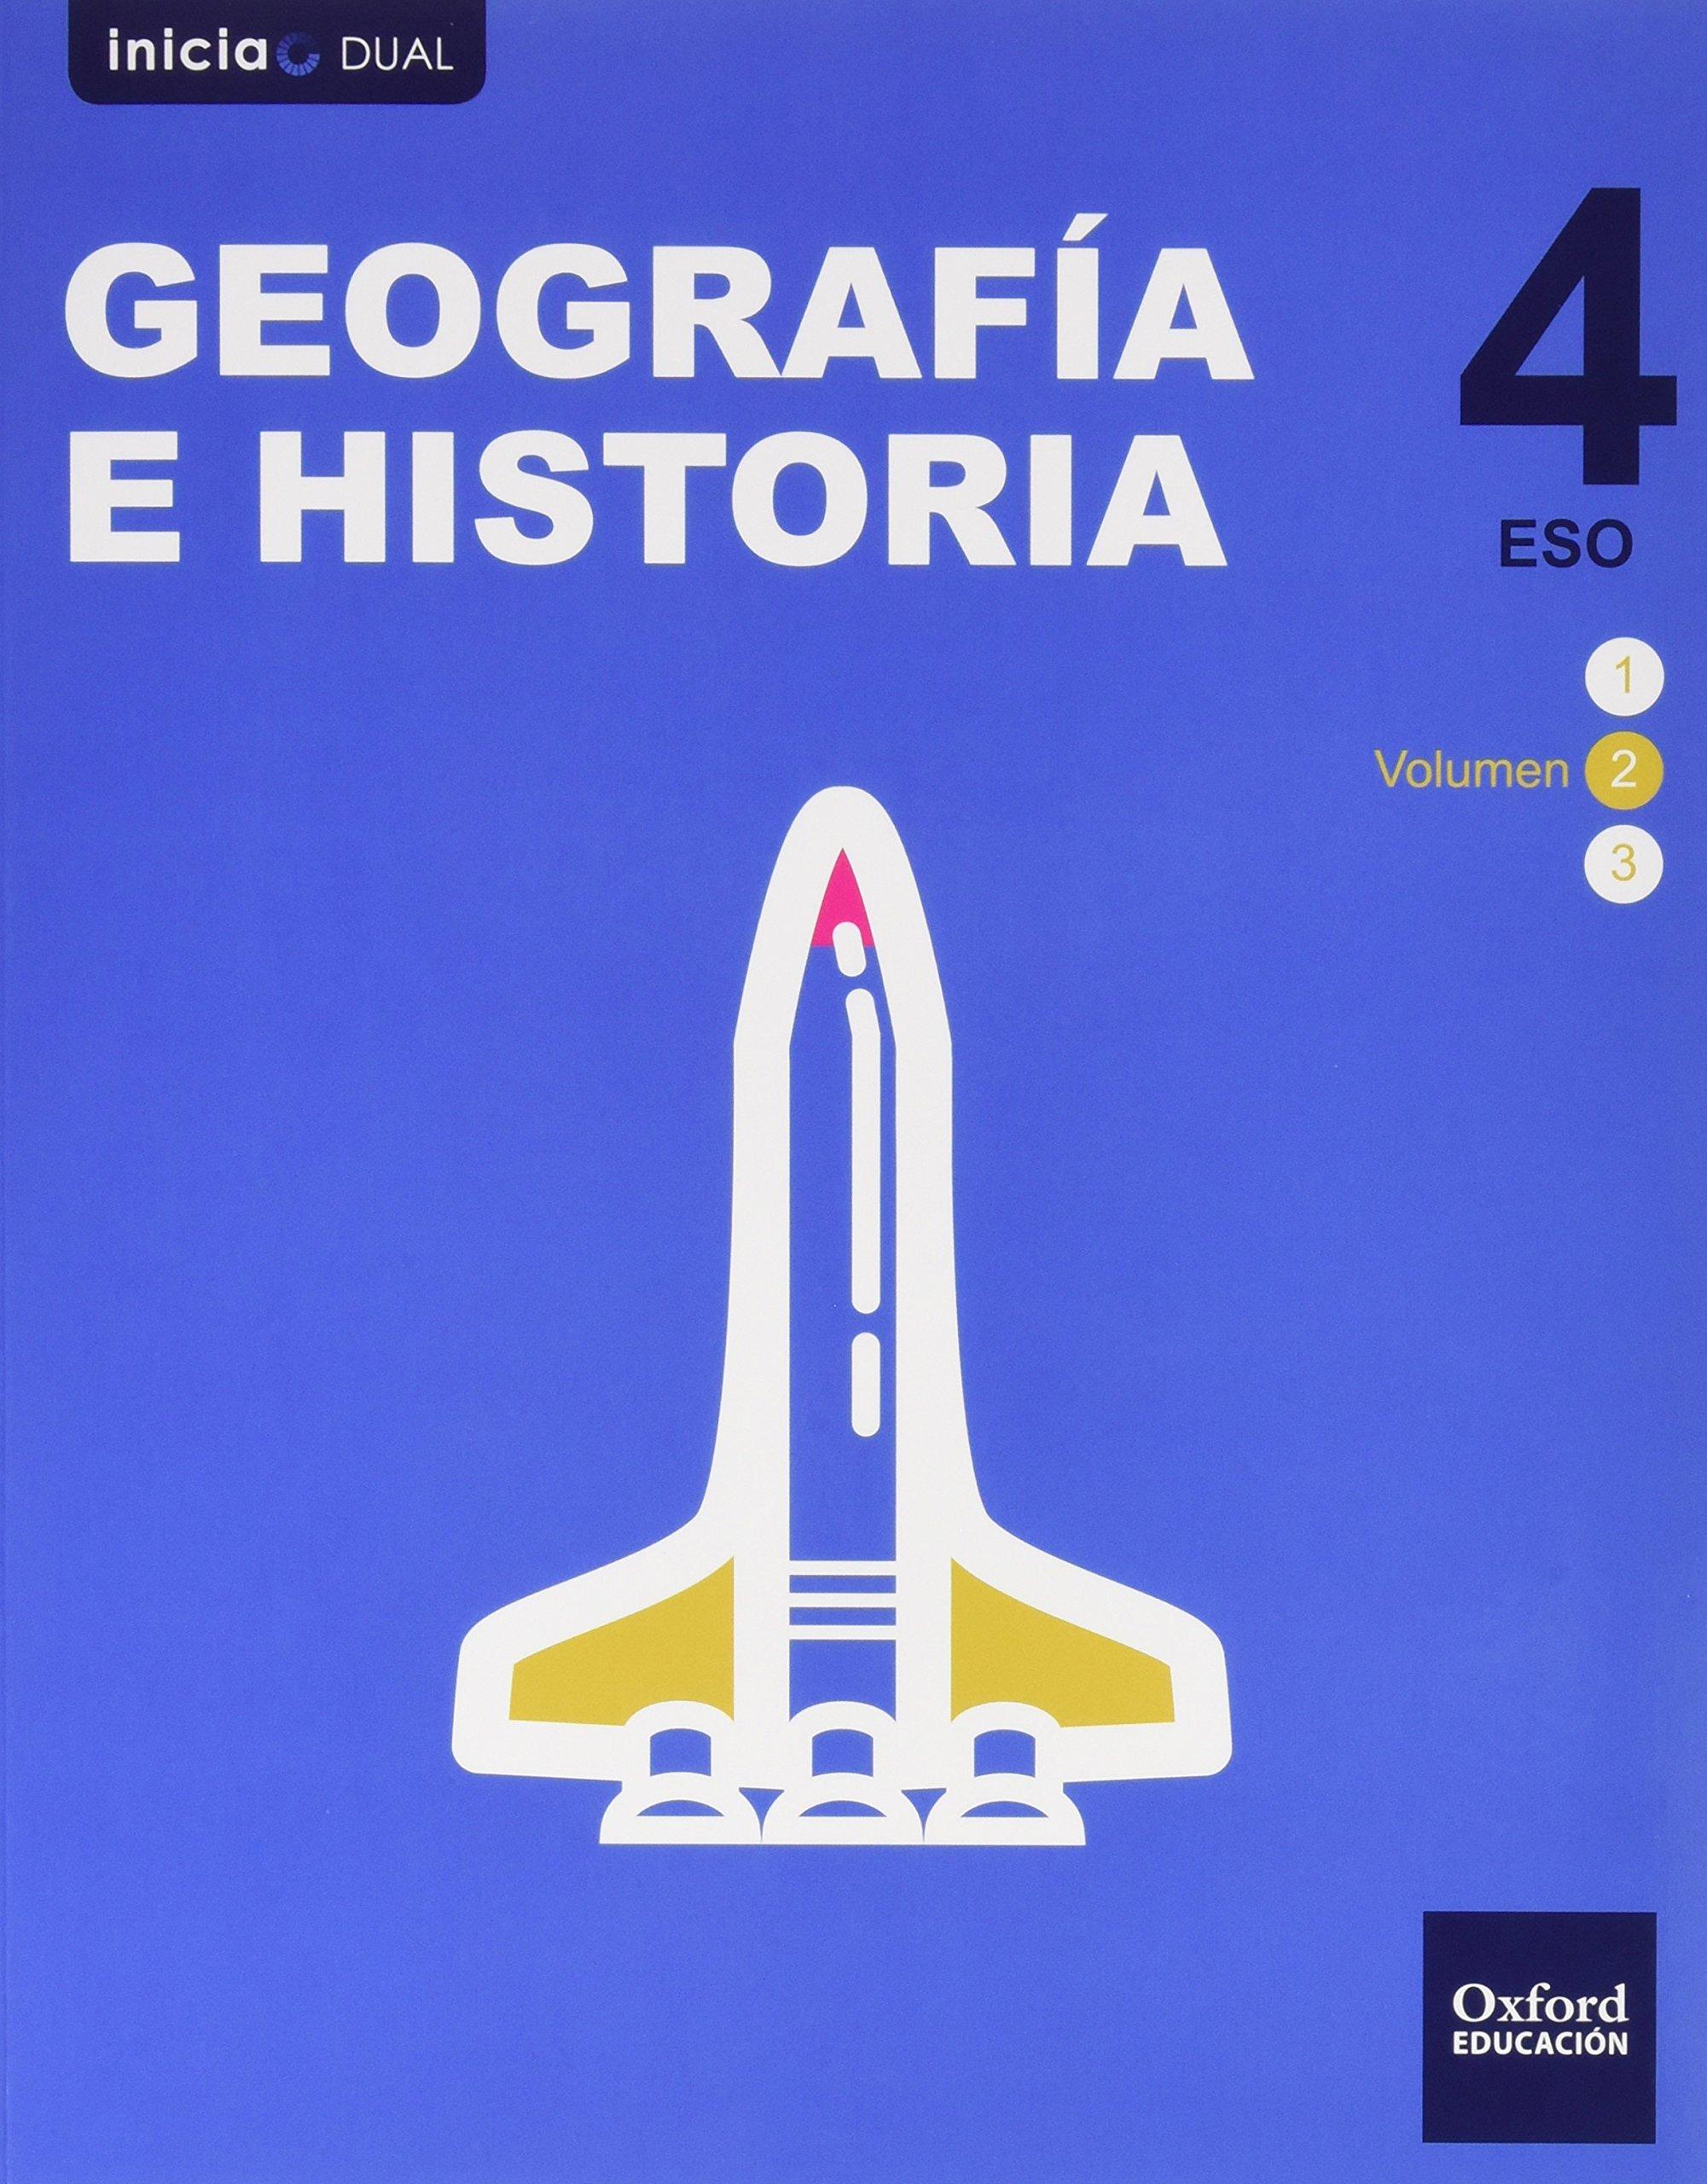 Geografía e Historia 4 ESO Oxford Soluciones 2020 / 2021